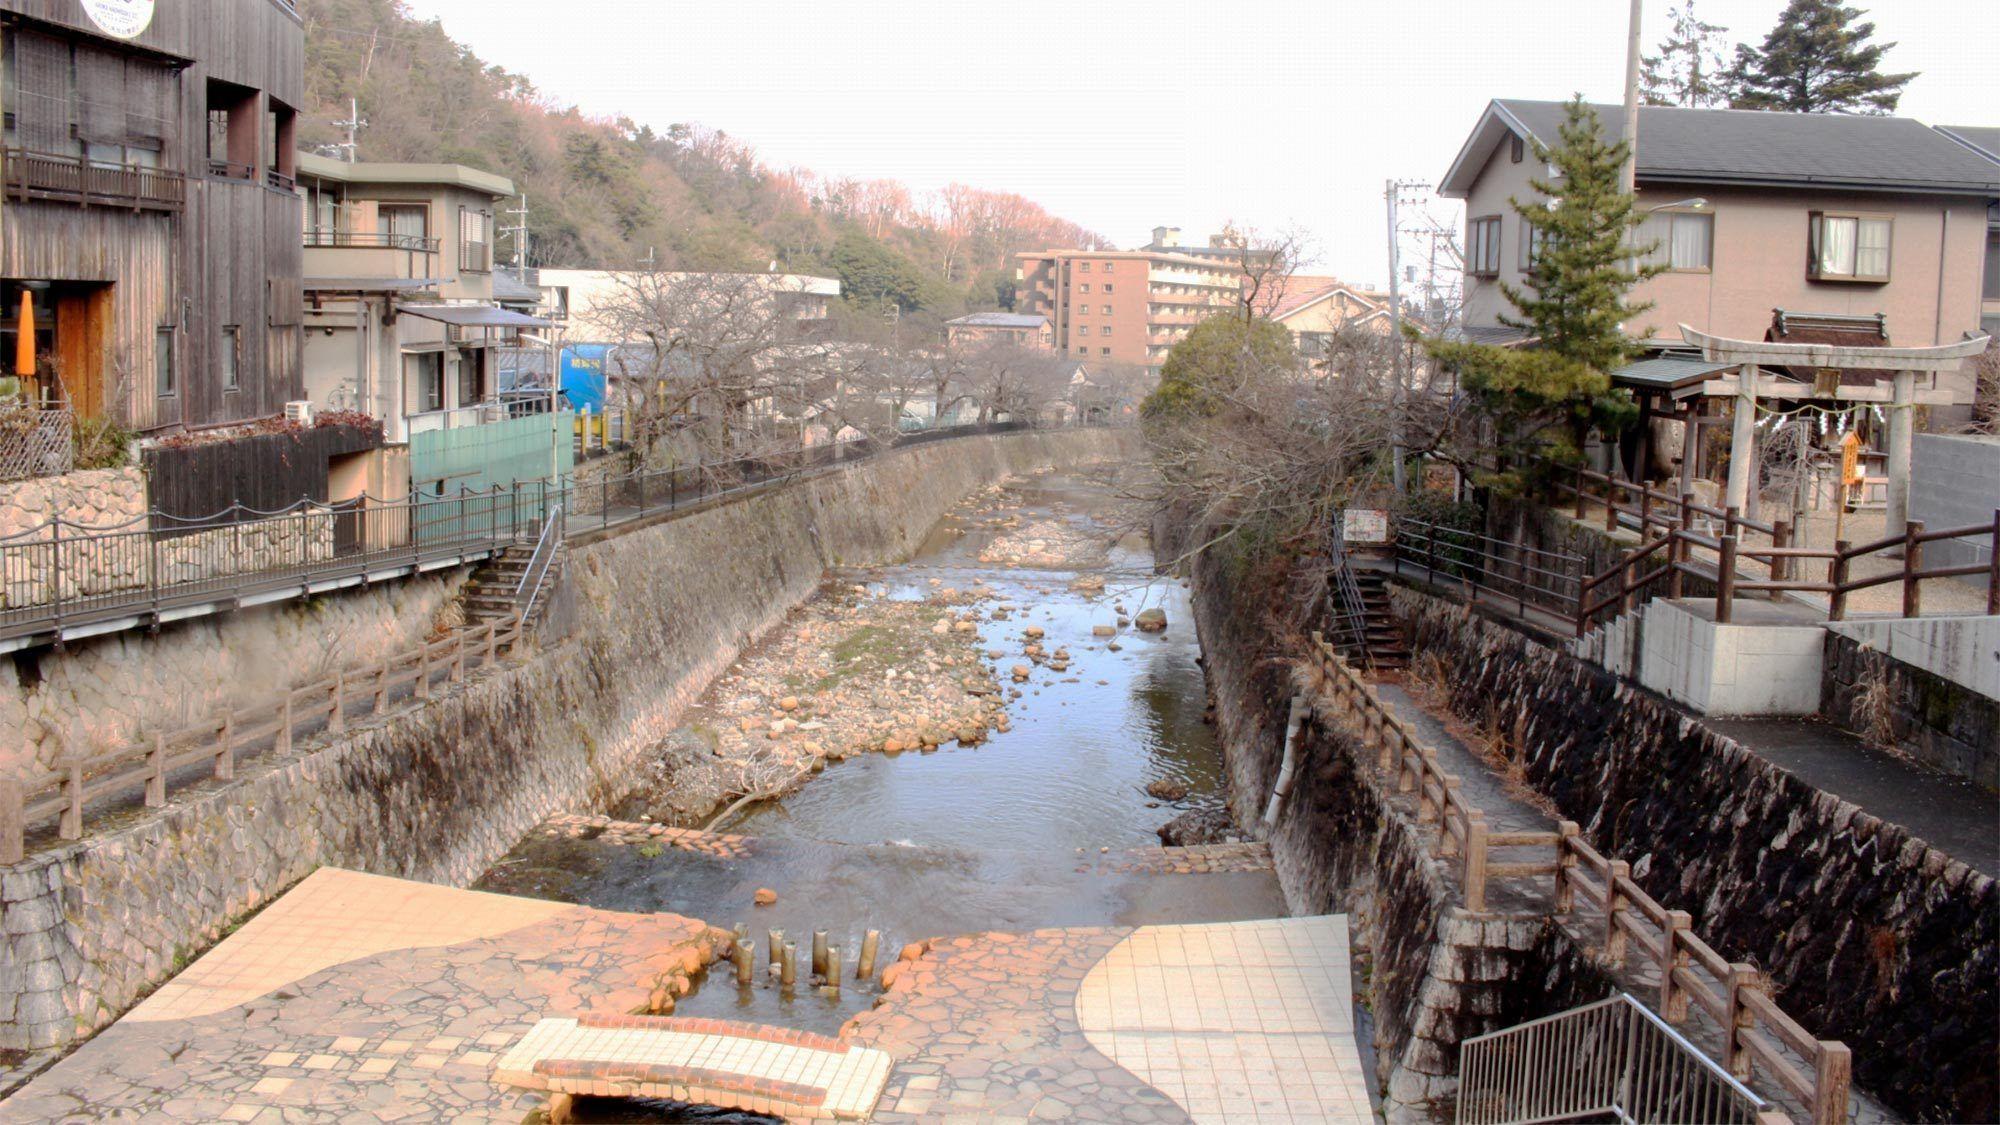 Private Full-Day Excursion to Kobe & Mount Rokko from Osaka